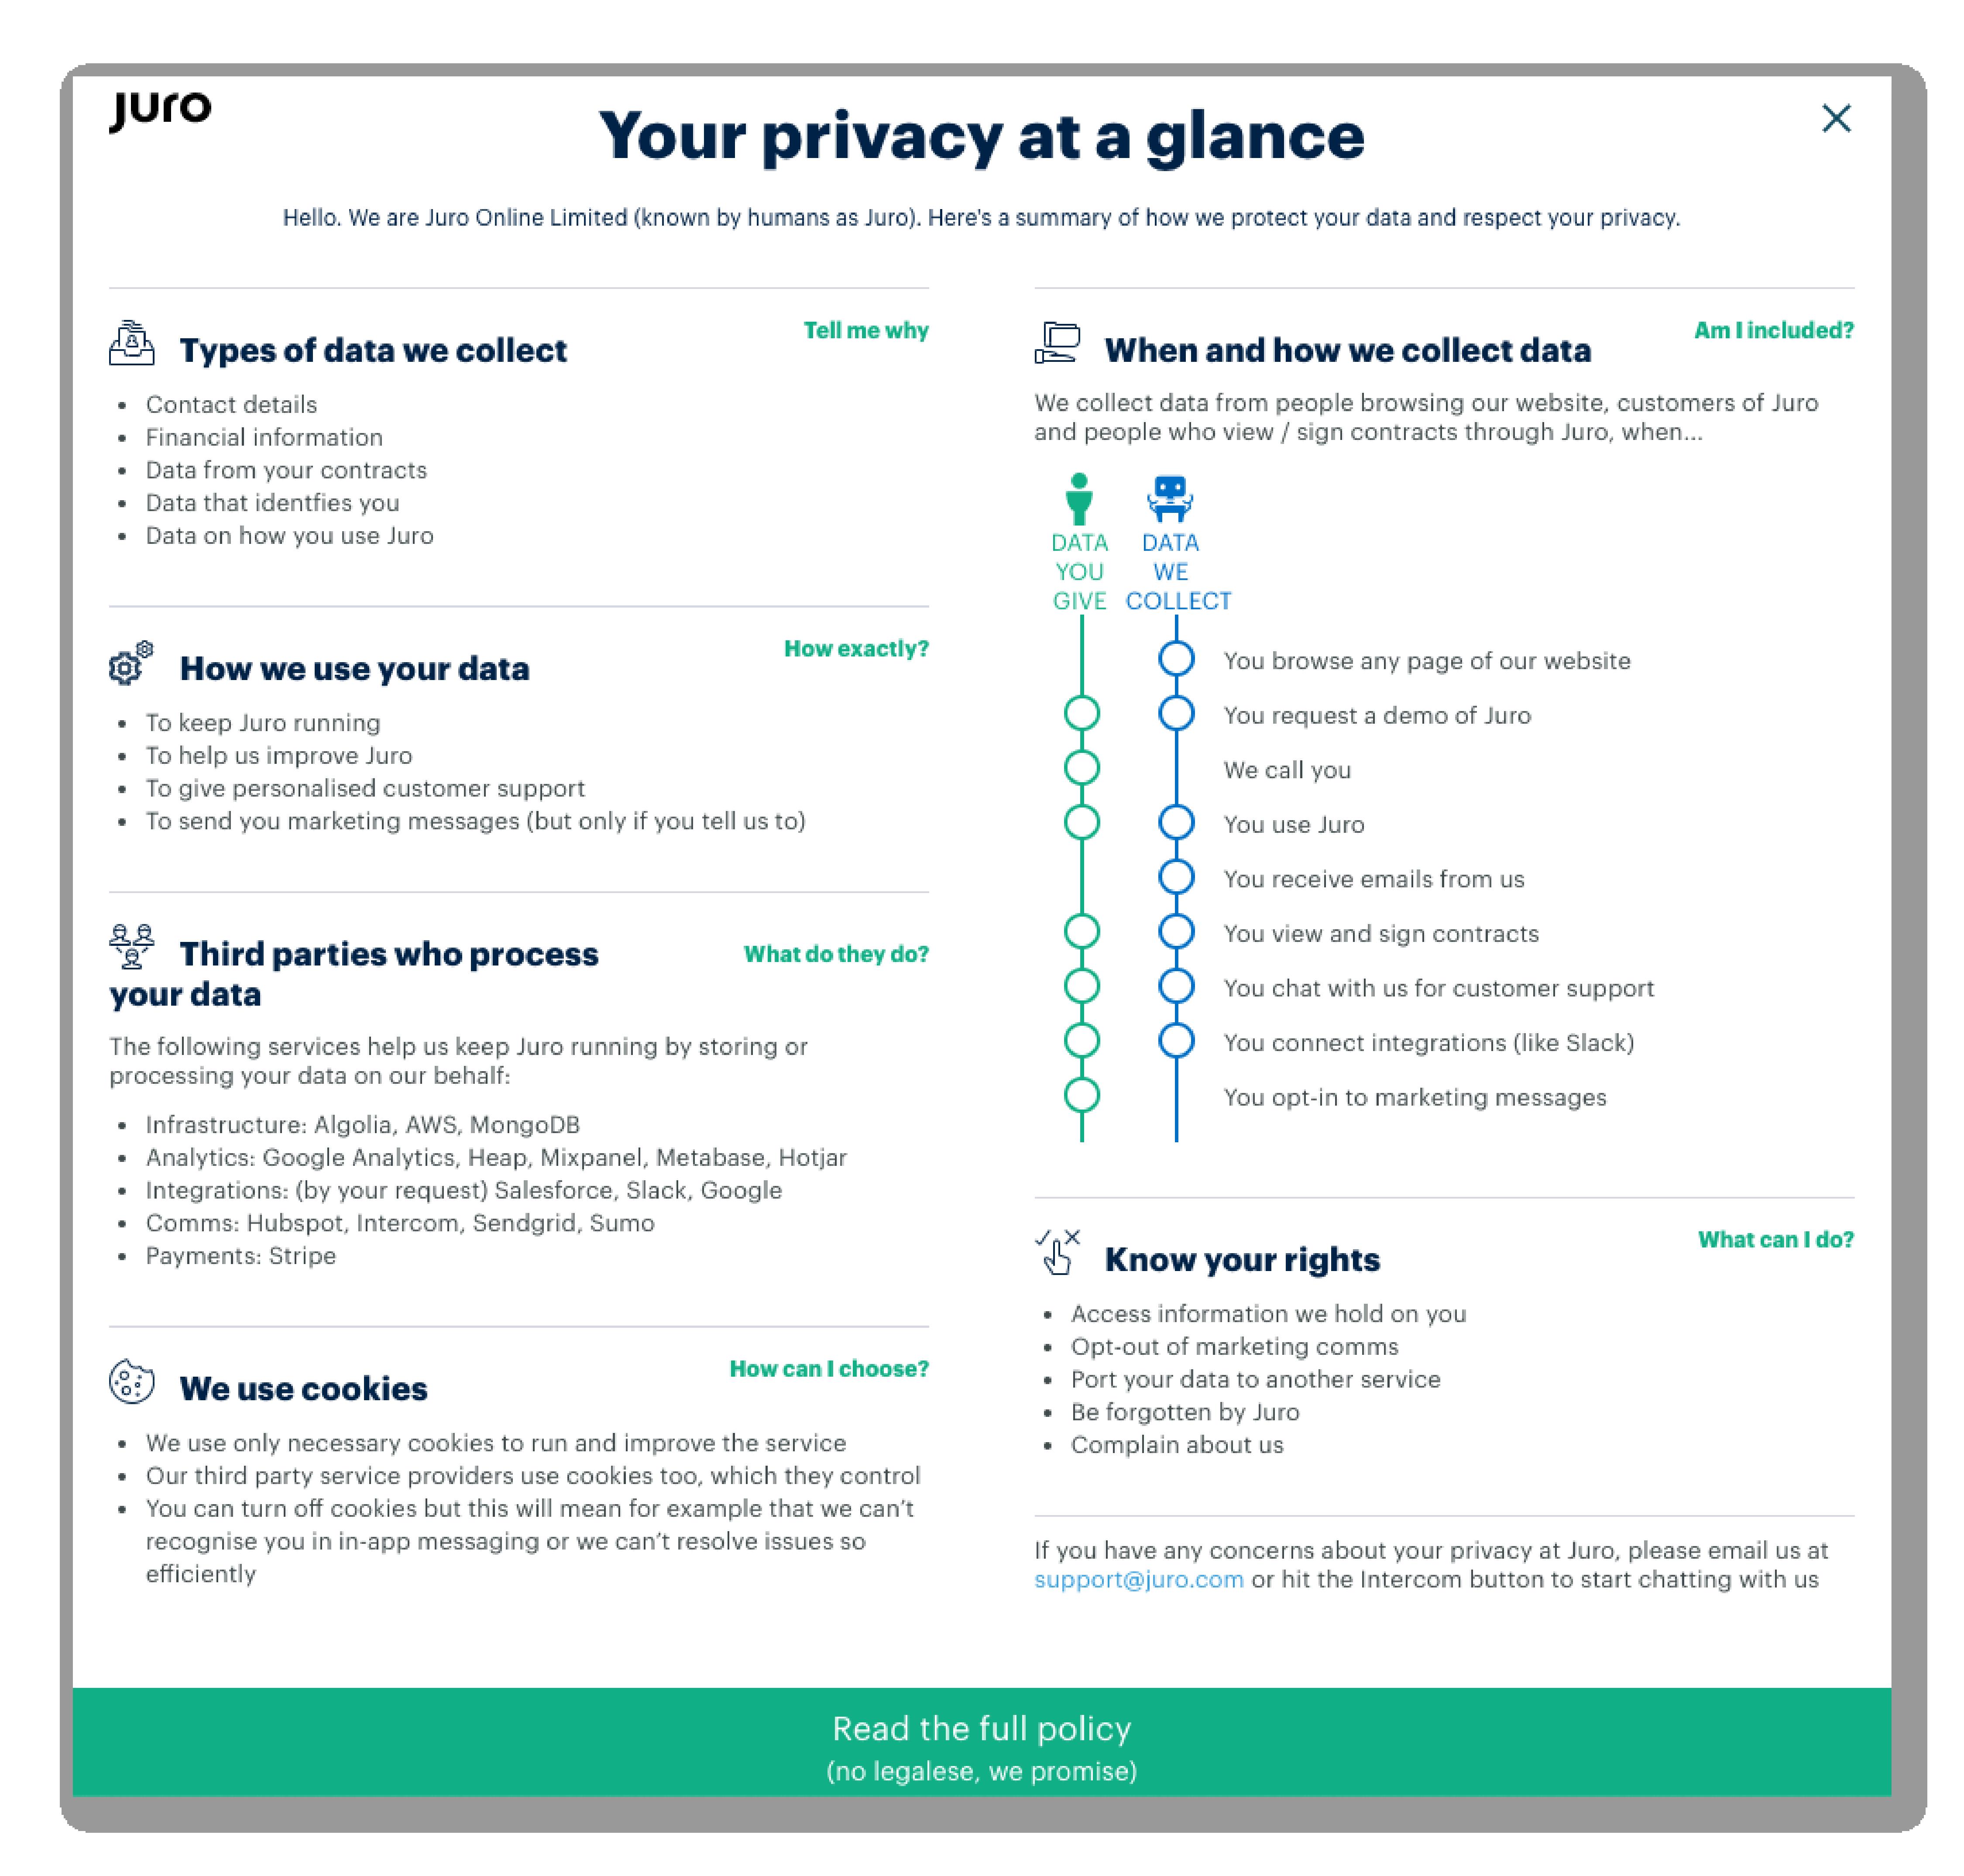 juro-privacy-policy-template-thumb-v2